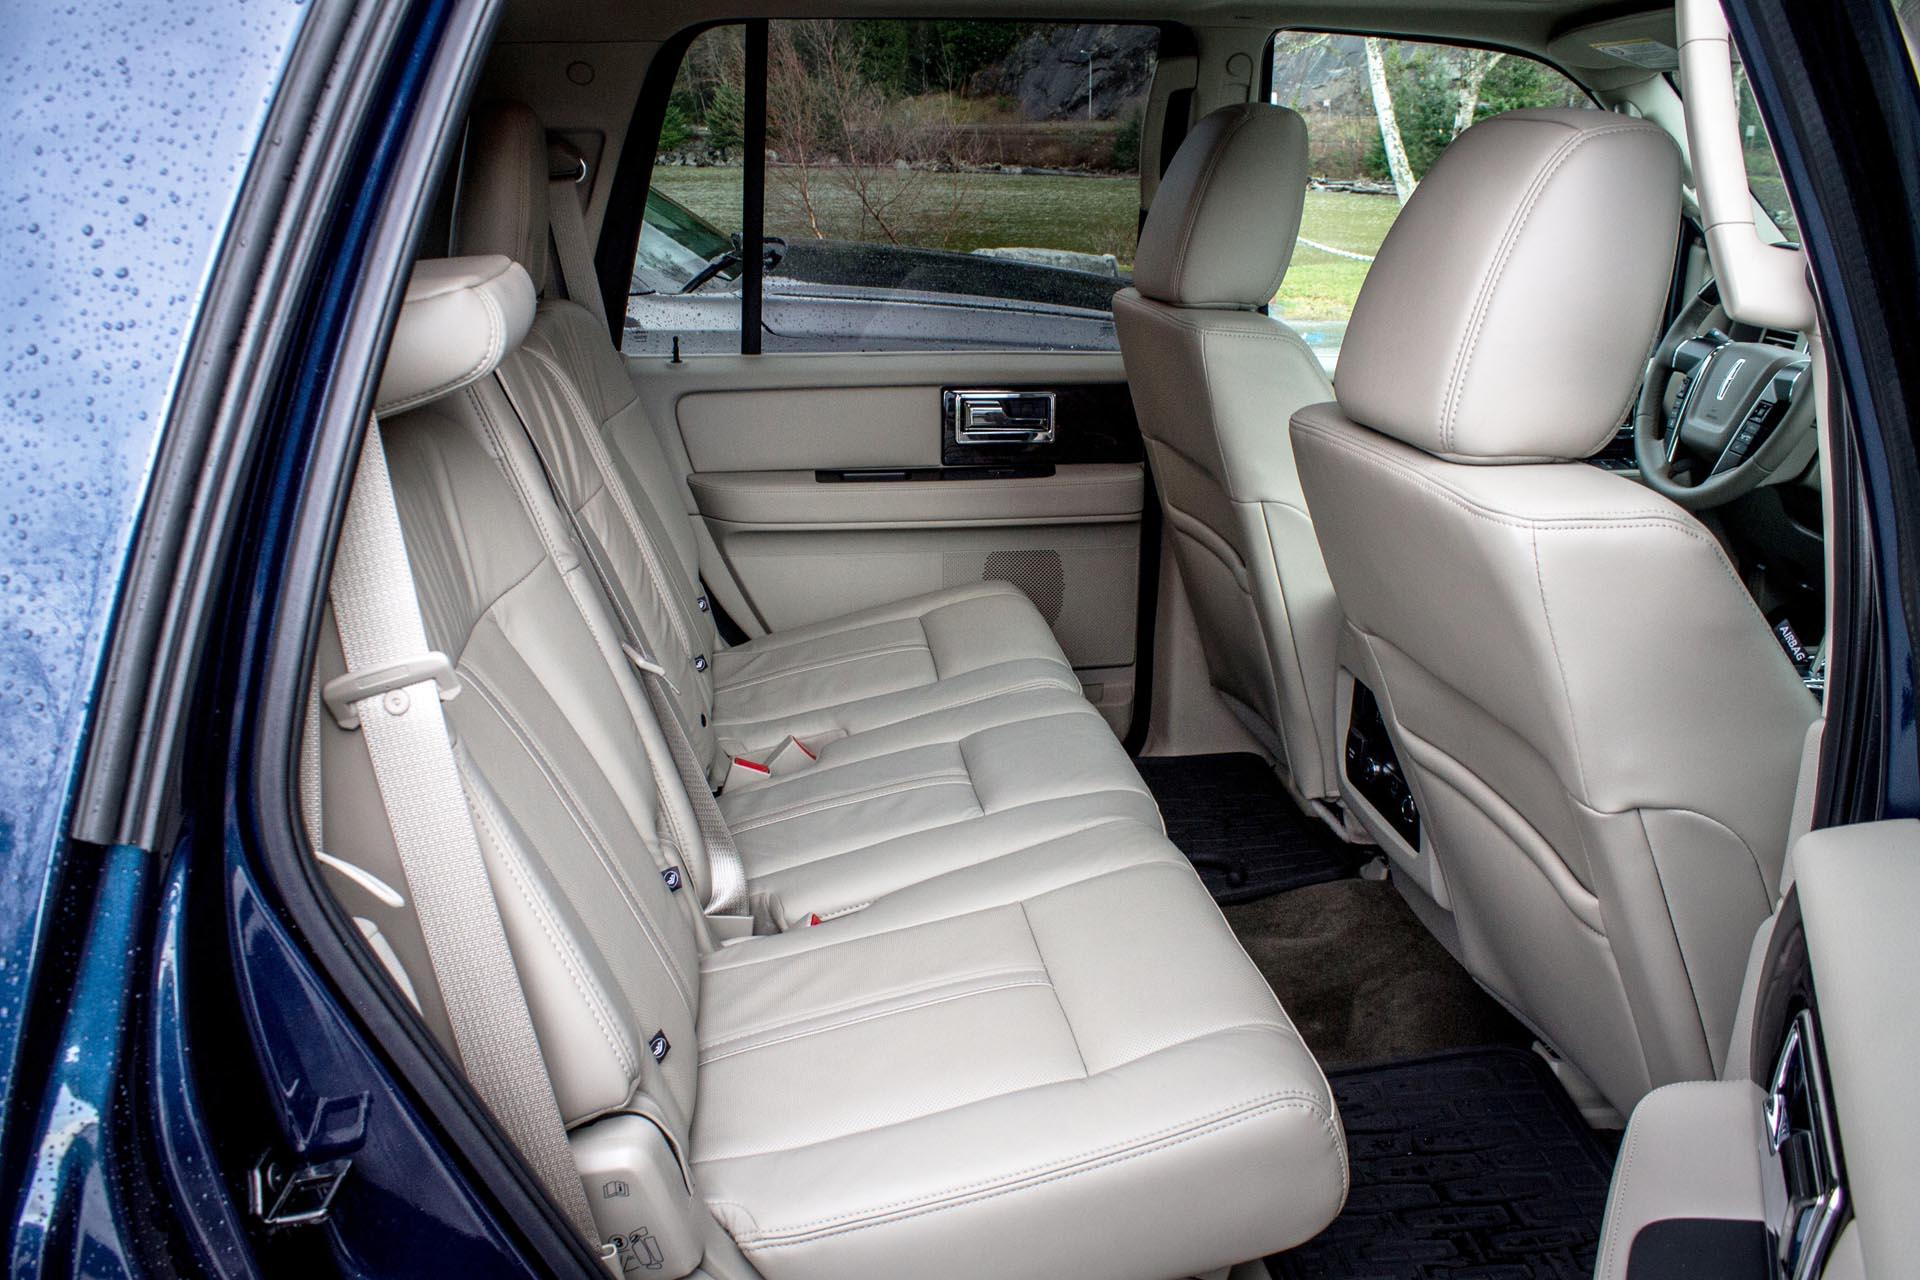 second-row seats